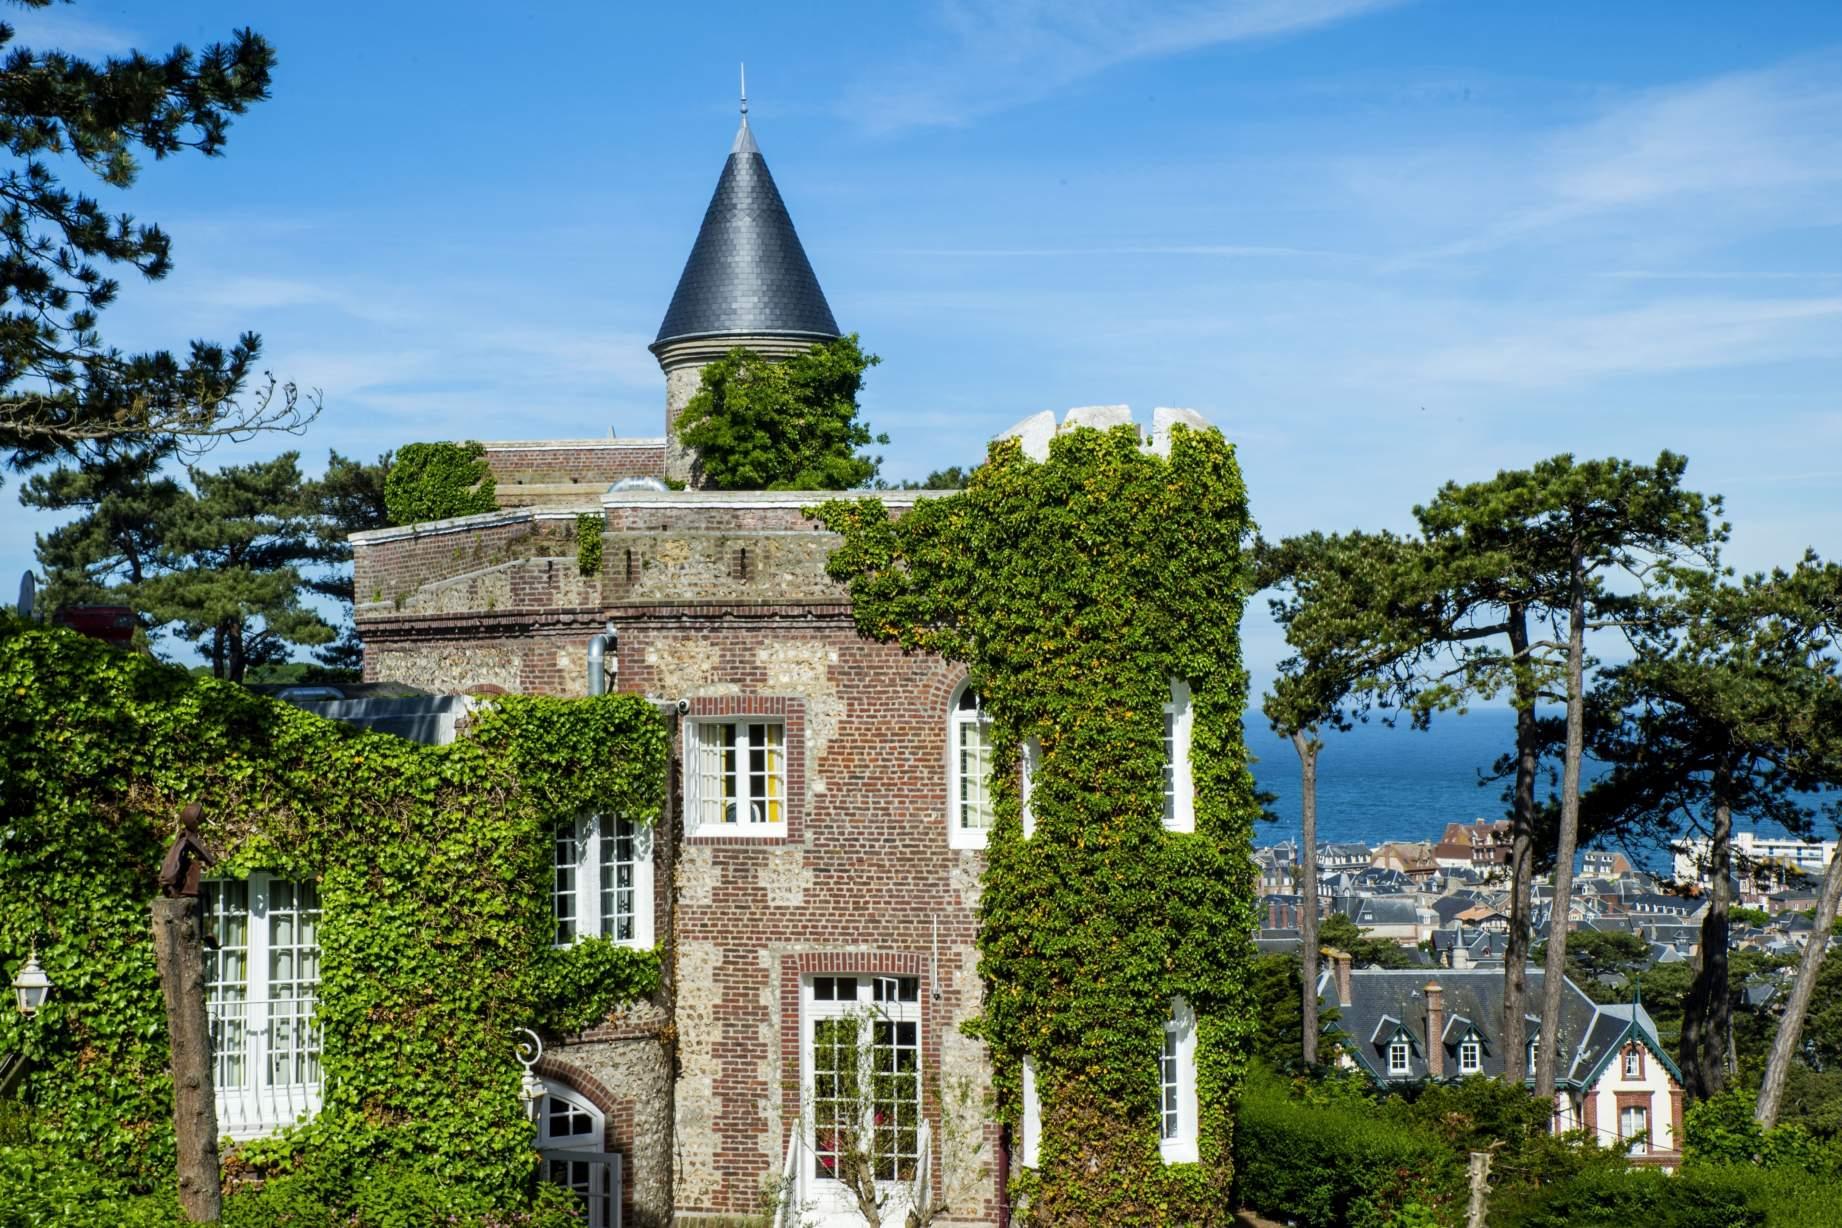 Golf-Expedition-Golf-Reizen-Frankrijk-Regio-Normandië-Domaine-Saint-Clair-kasteel-groen